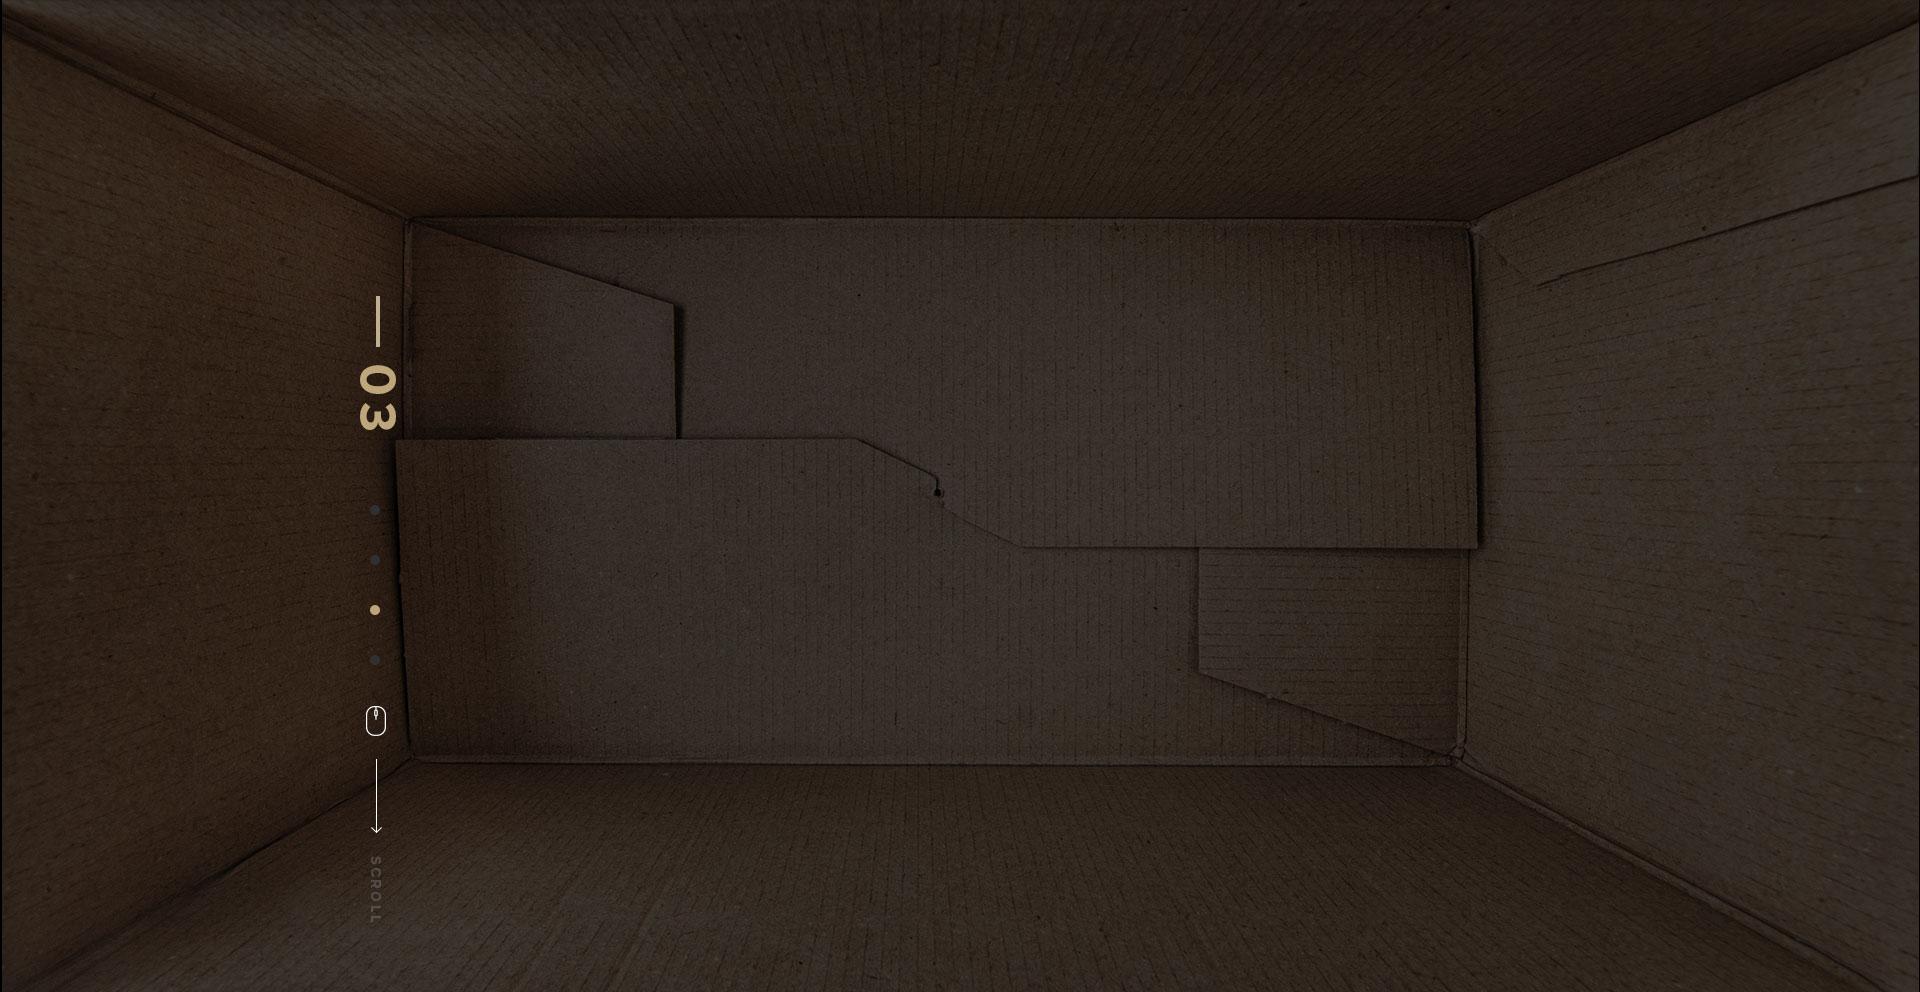 lemacarton-slide3